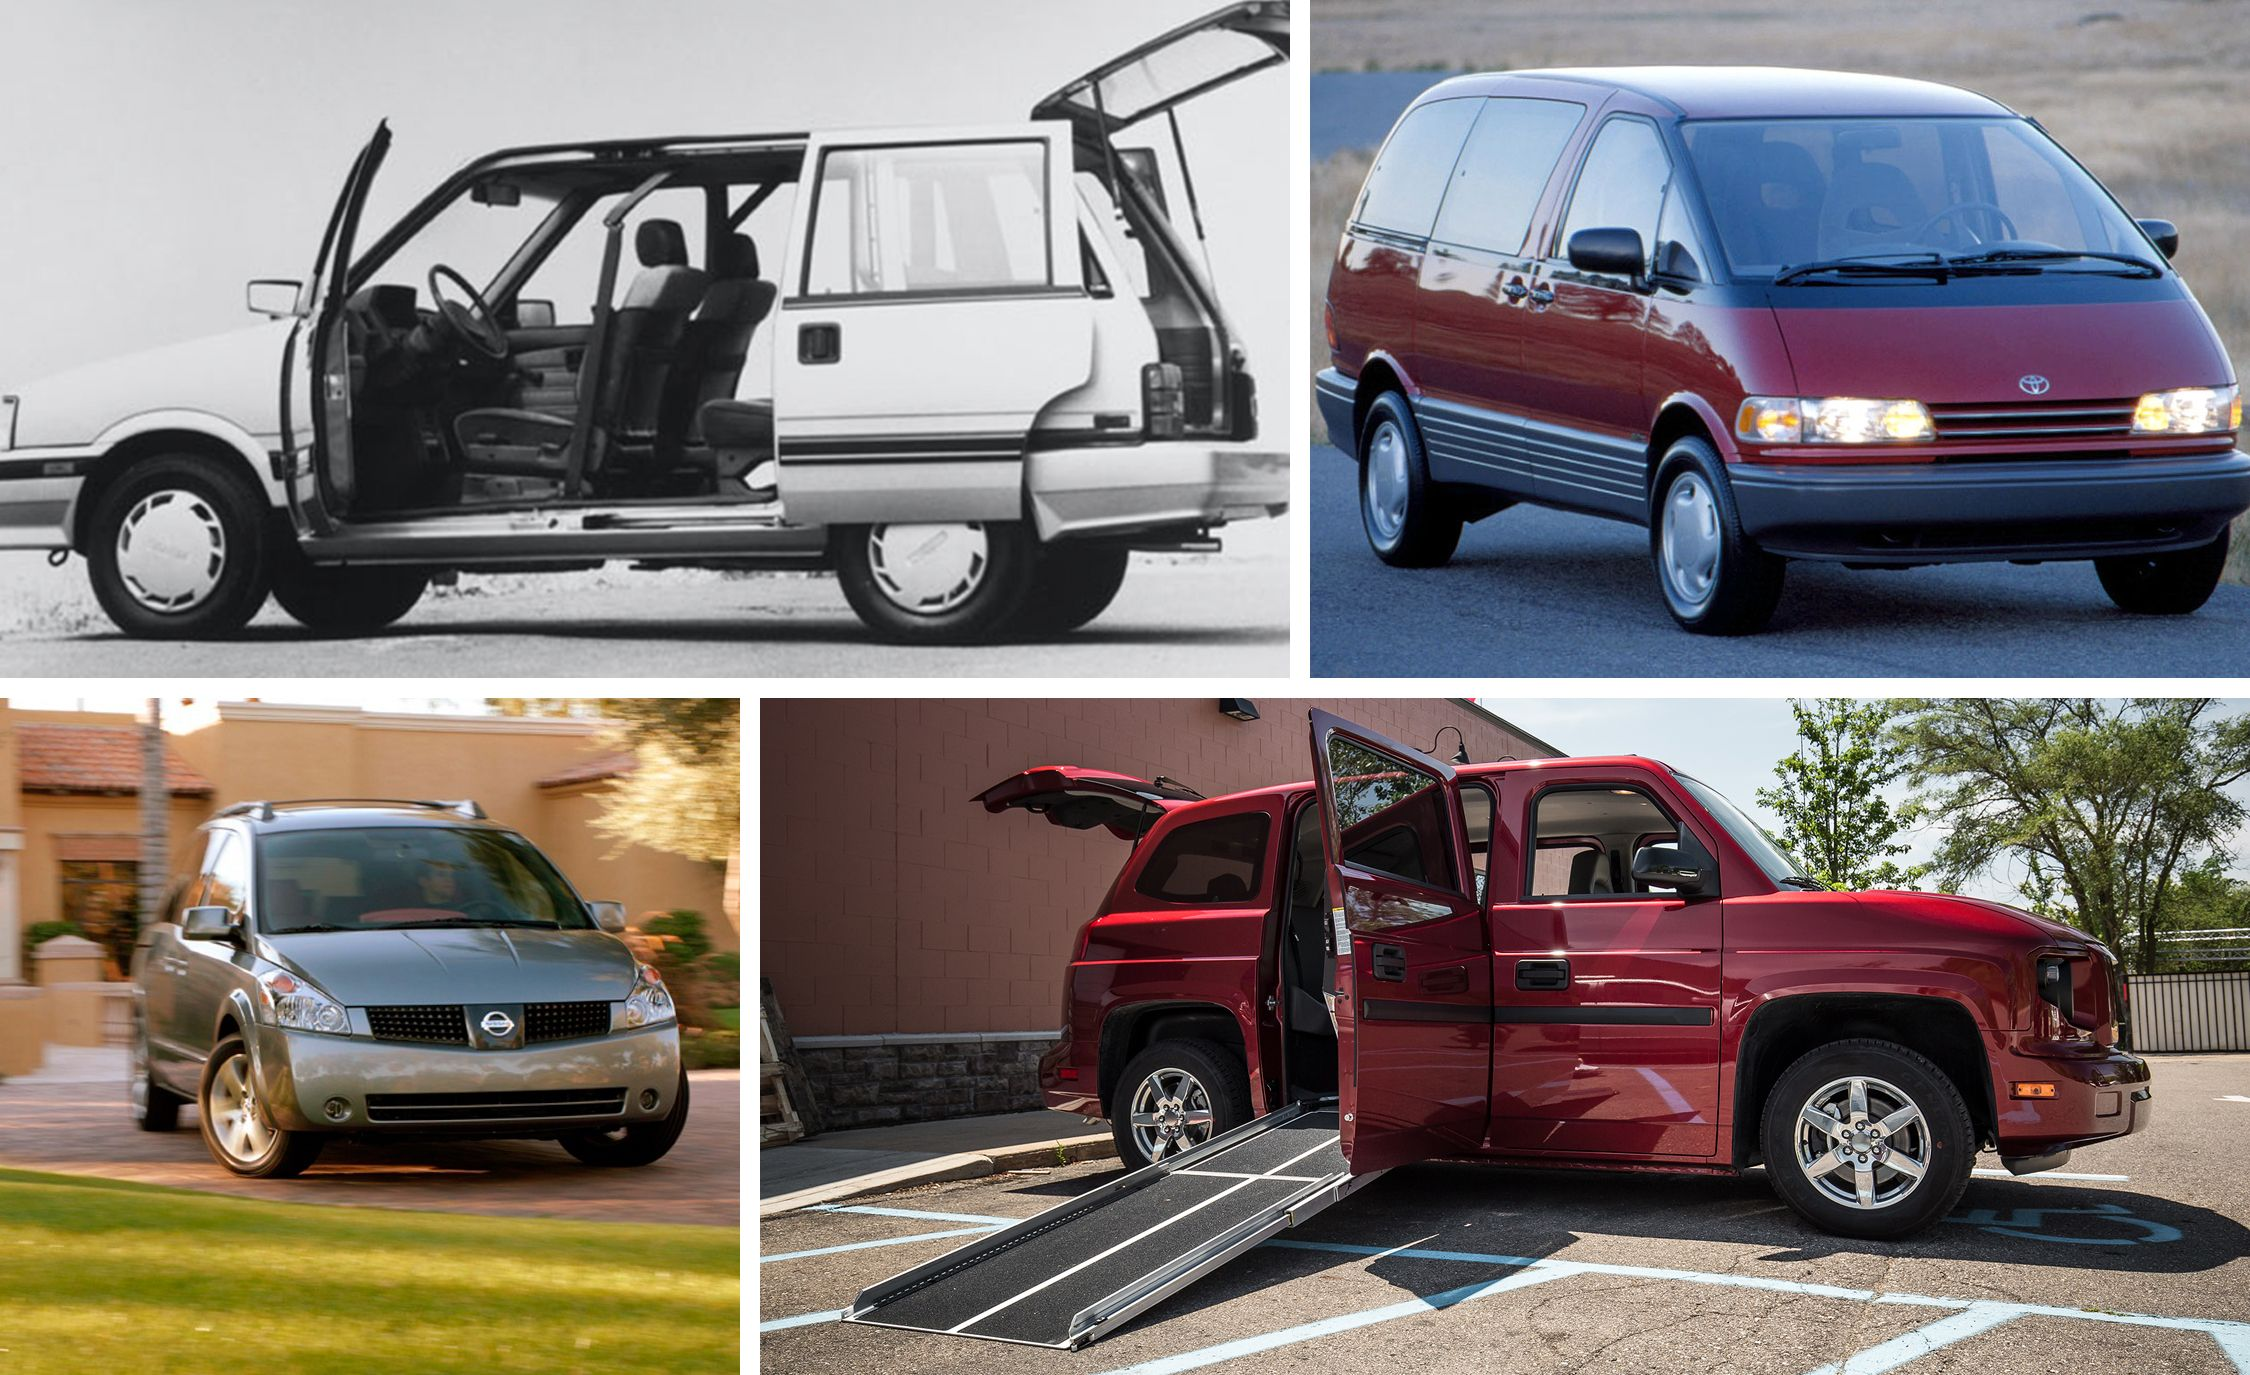 weirdest, most unique minivans ever